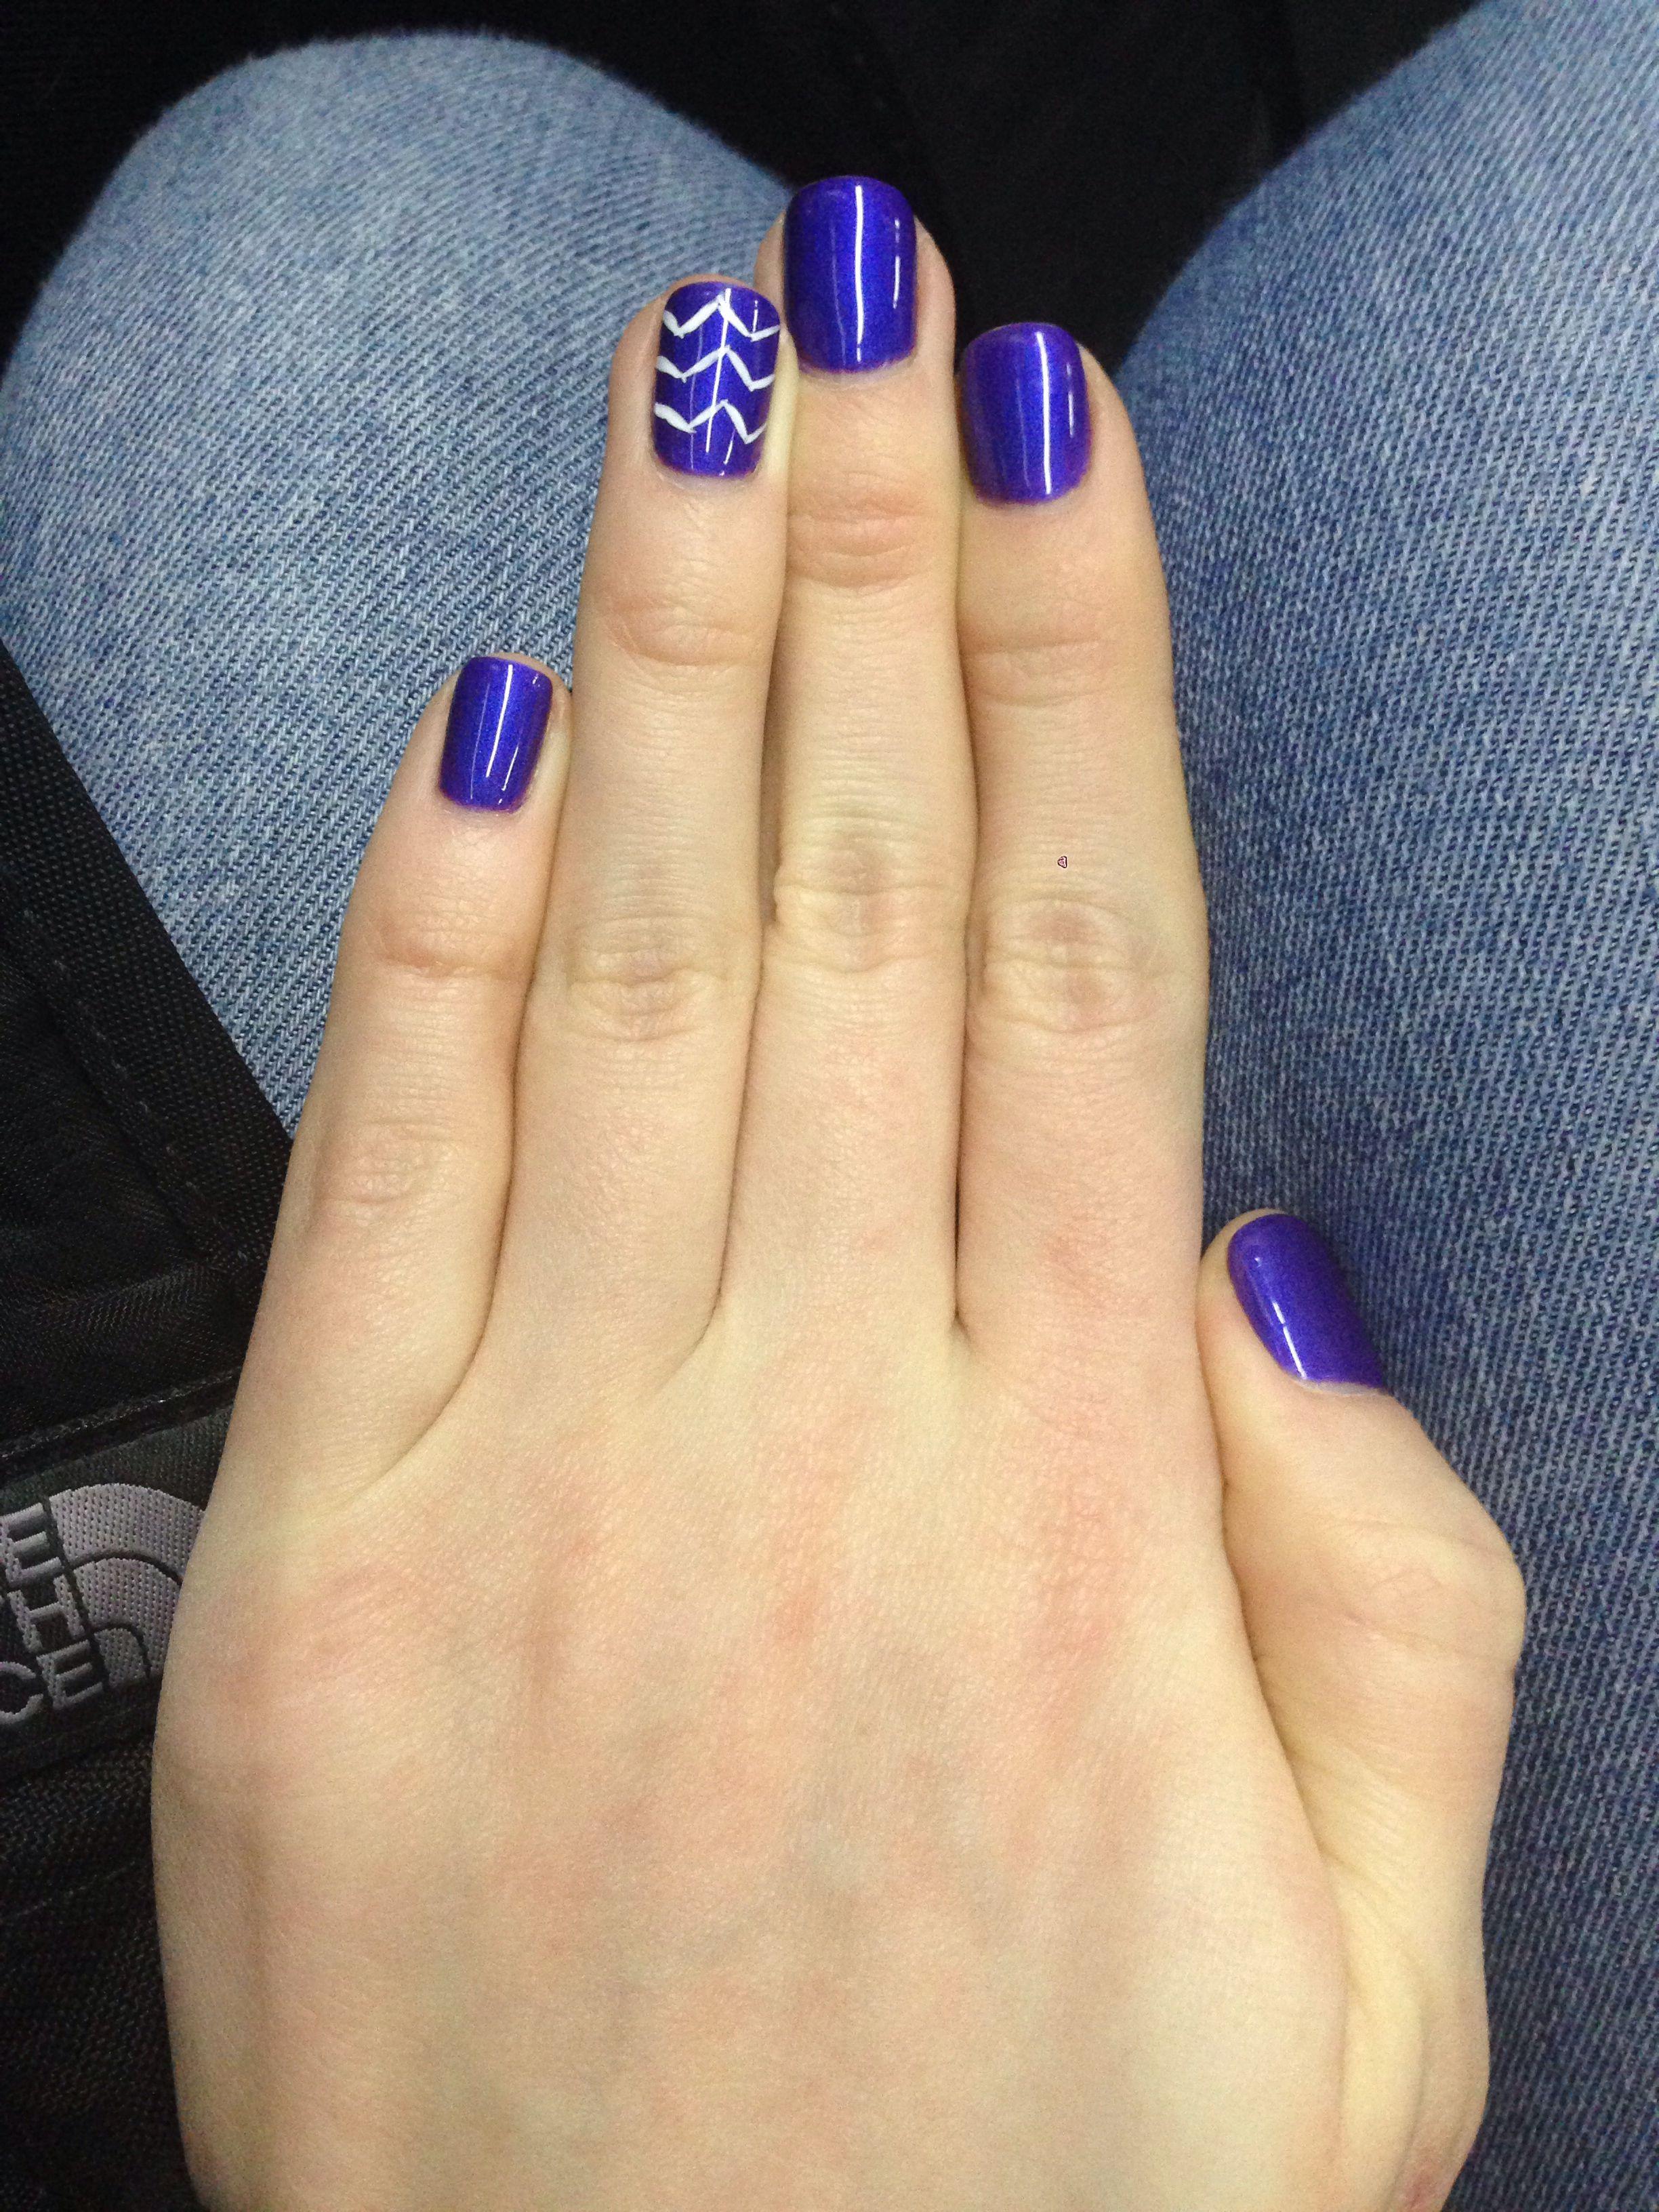 2/17/2014 ... Current nail polish design